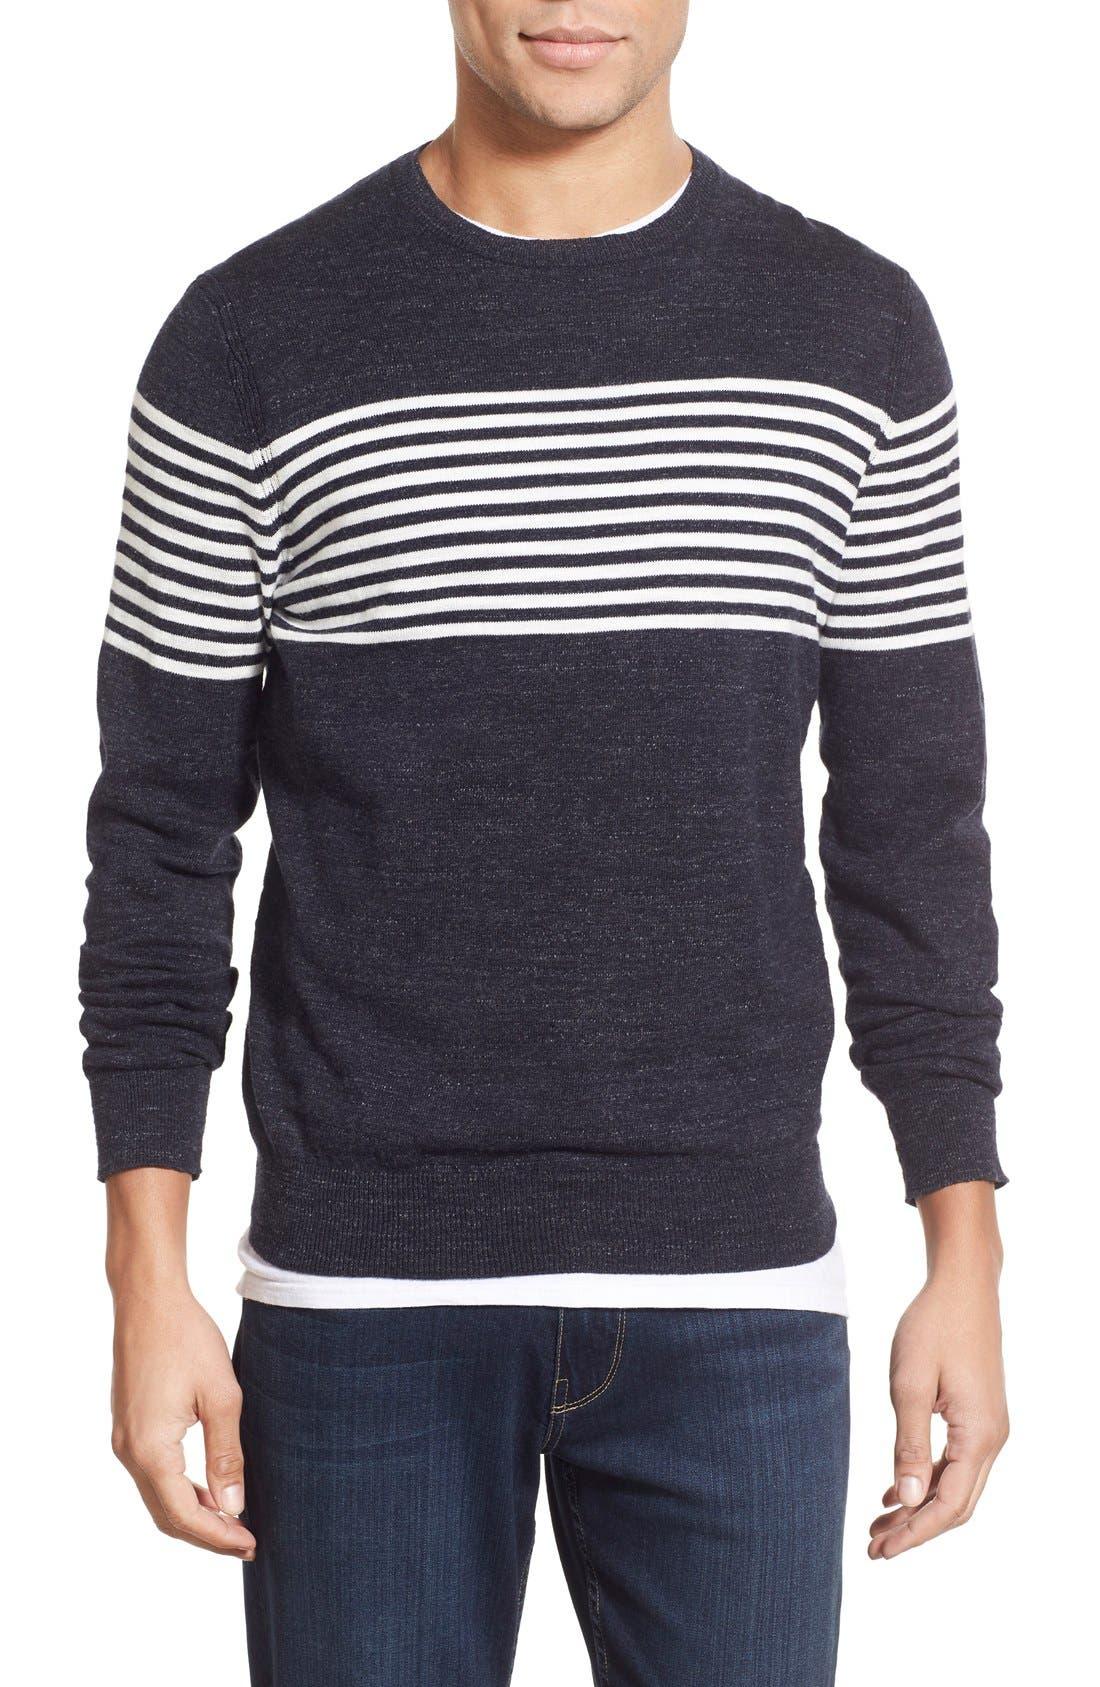 'Shore Club' Chest Stripe Crewneck Sweater,                             Main thumbnail 1, color,                             Navy